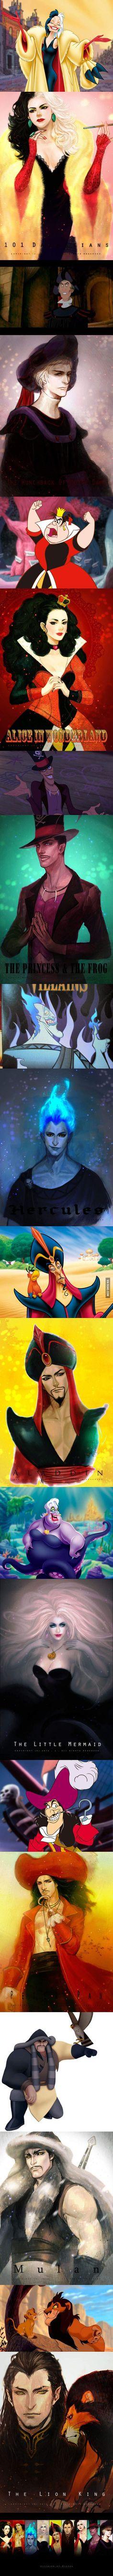 If Disney Villains Were Beautiful.